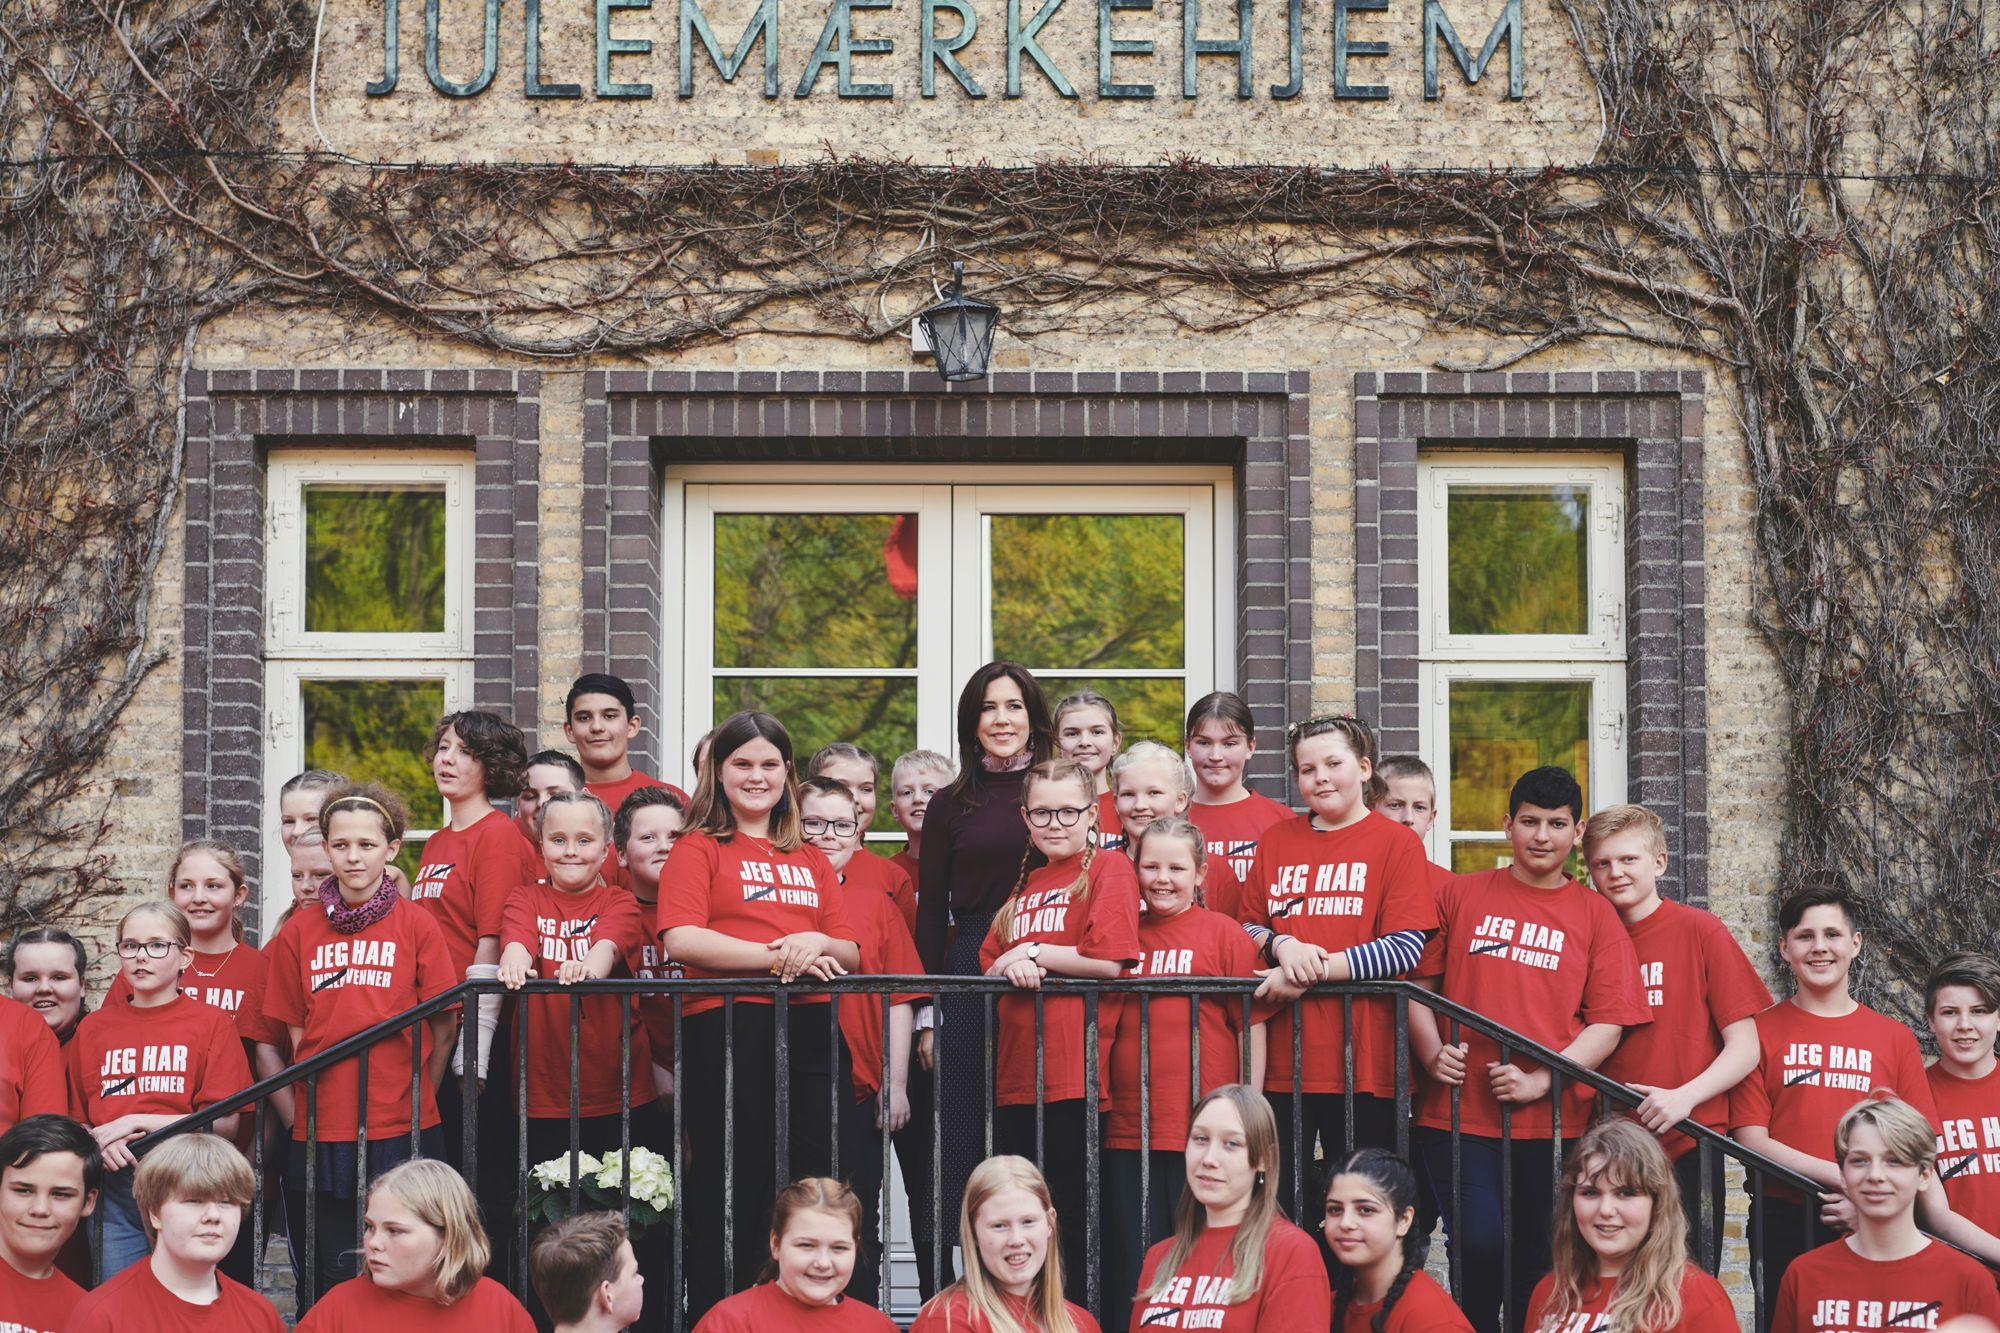 Julemaerket-2019-Julemaerkehjem-Hobro-80-aar-jubilaeum